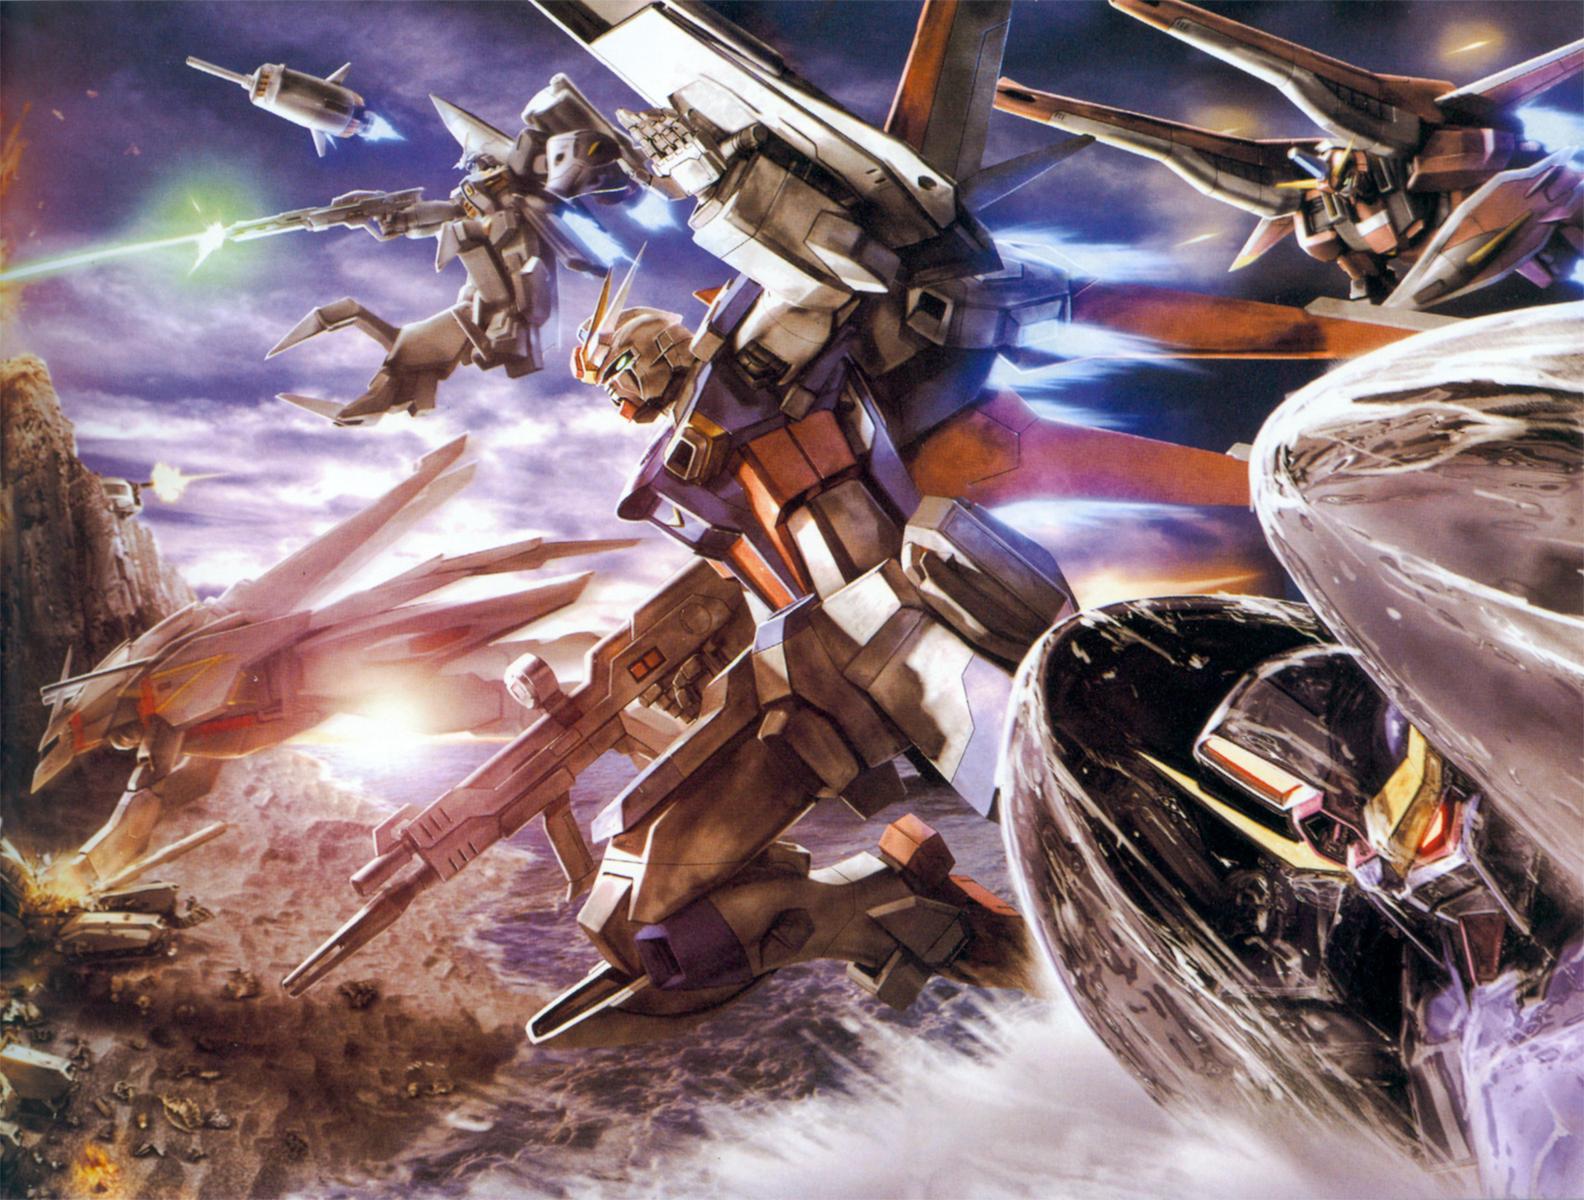 Gundam SEED Wallpaper Wallpaperholic 1584x1200